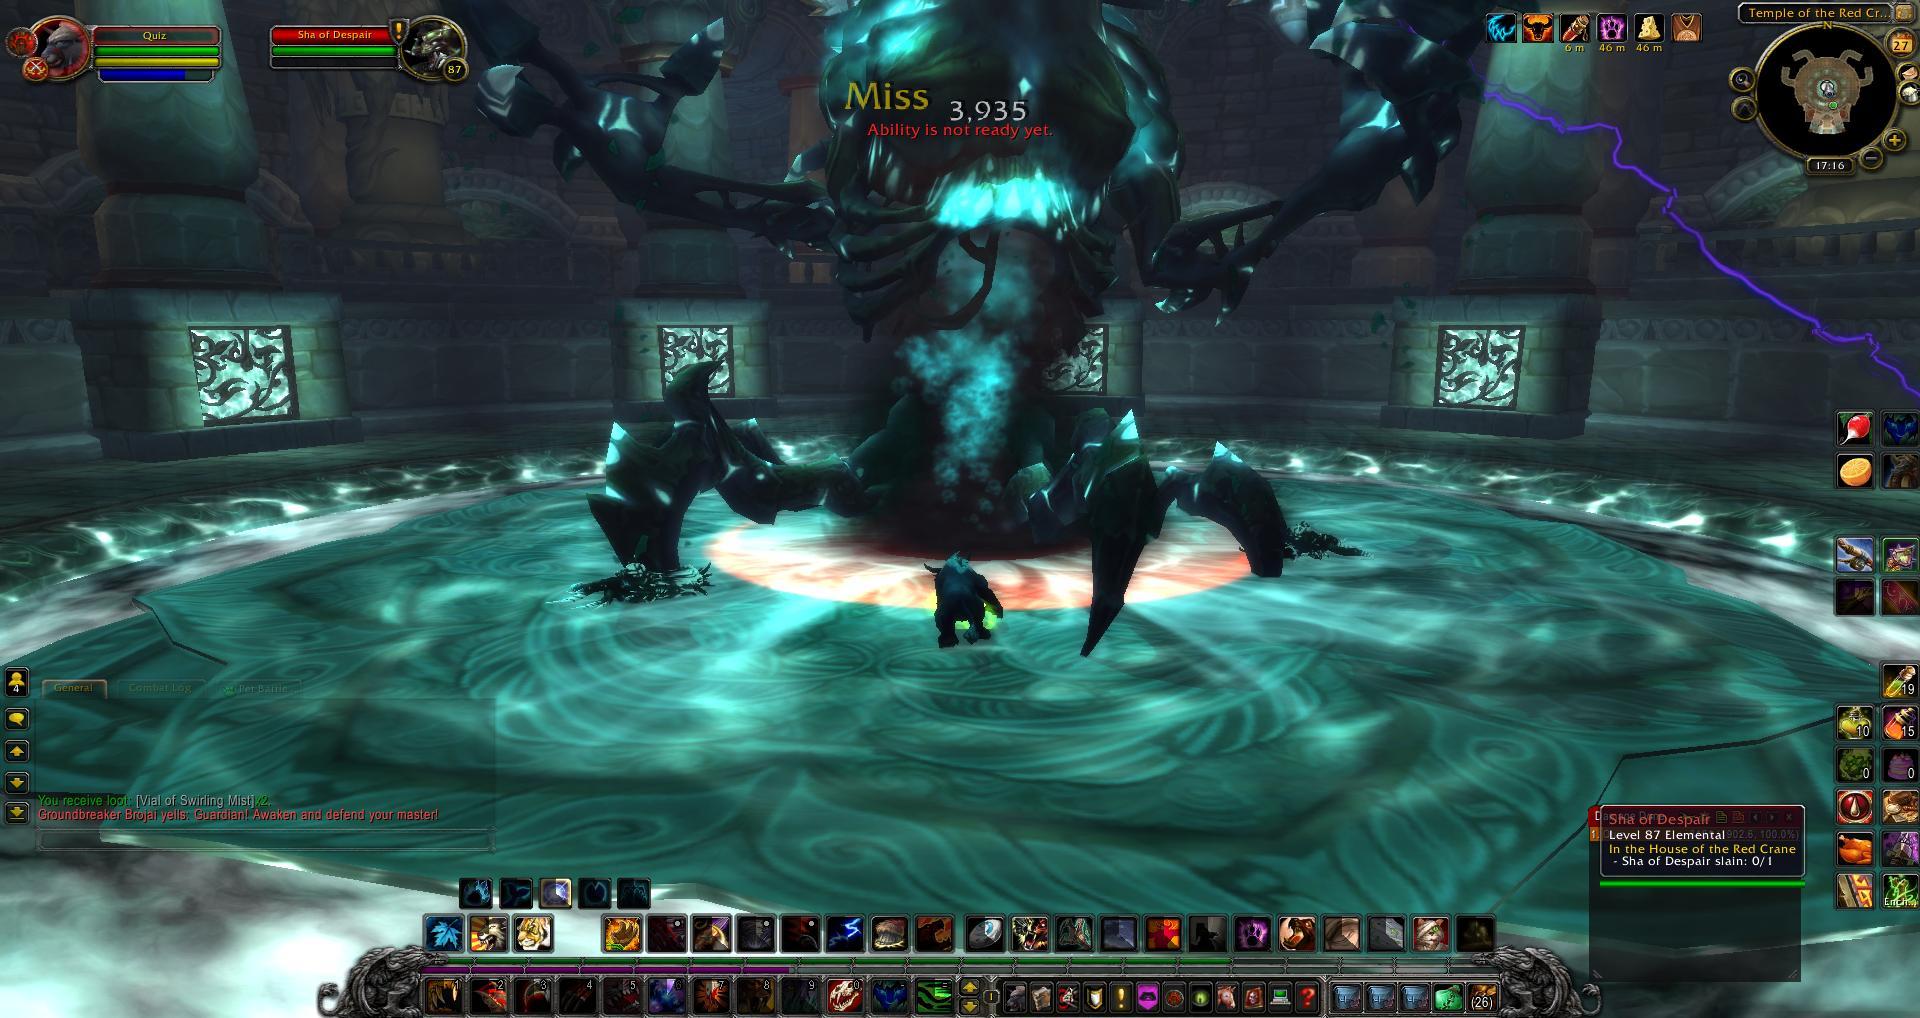 Sha of Despair wow screenshot - Gamingcfg.com